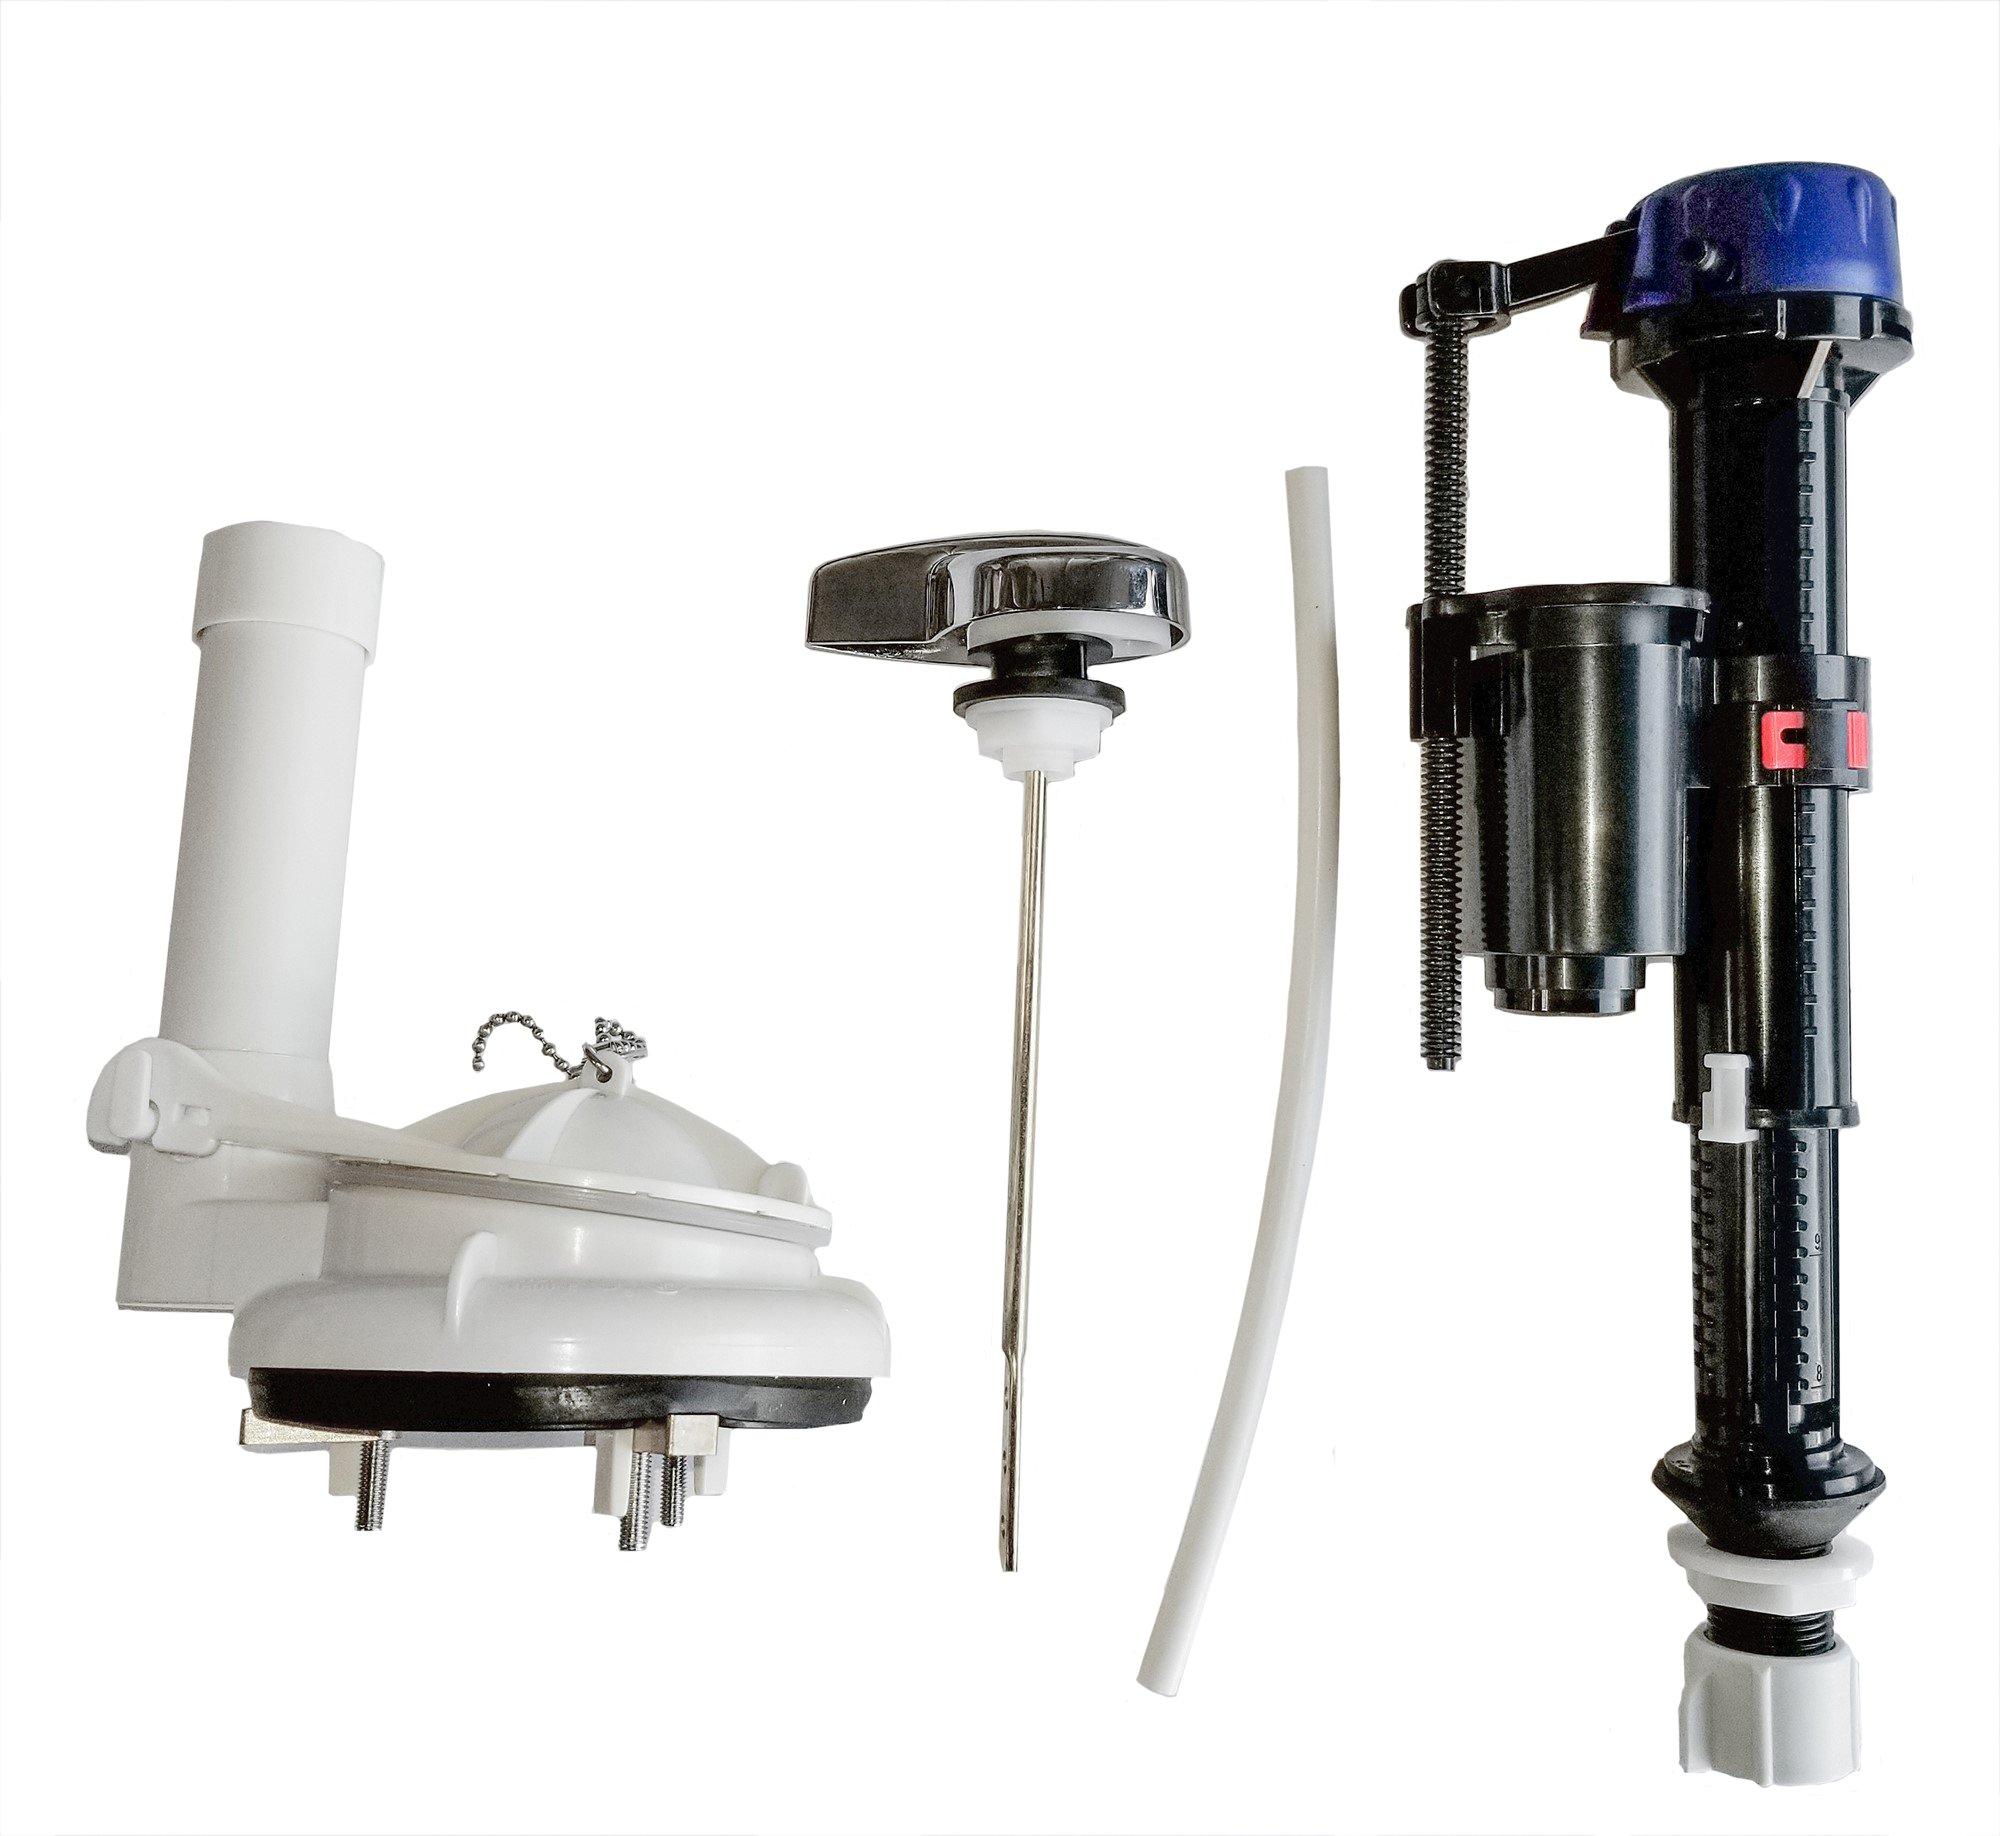 EAGO R-133FLUSH Replacement Toilet Flushing Mechanism for TB133 by EAGO